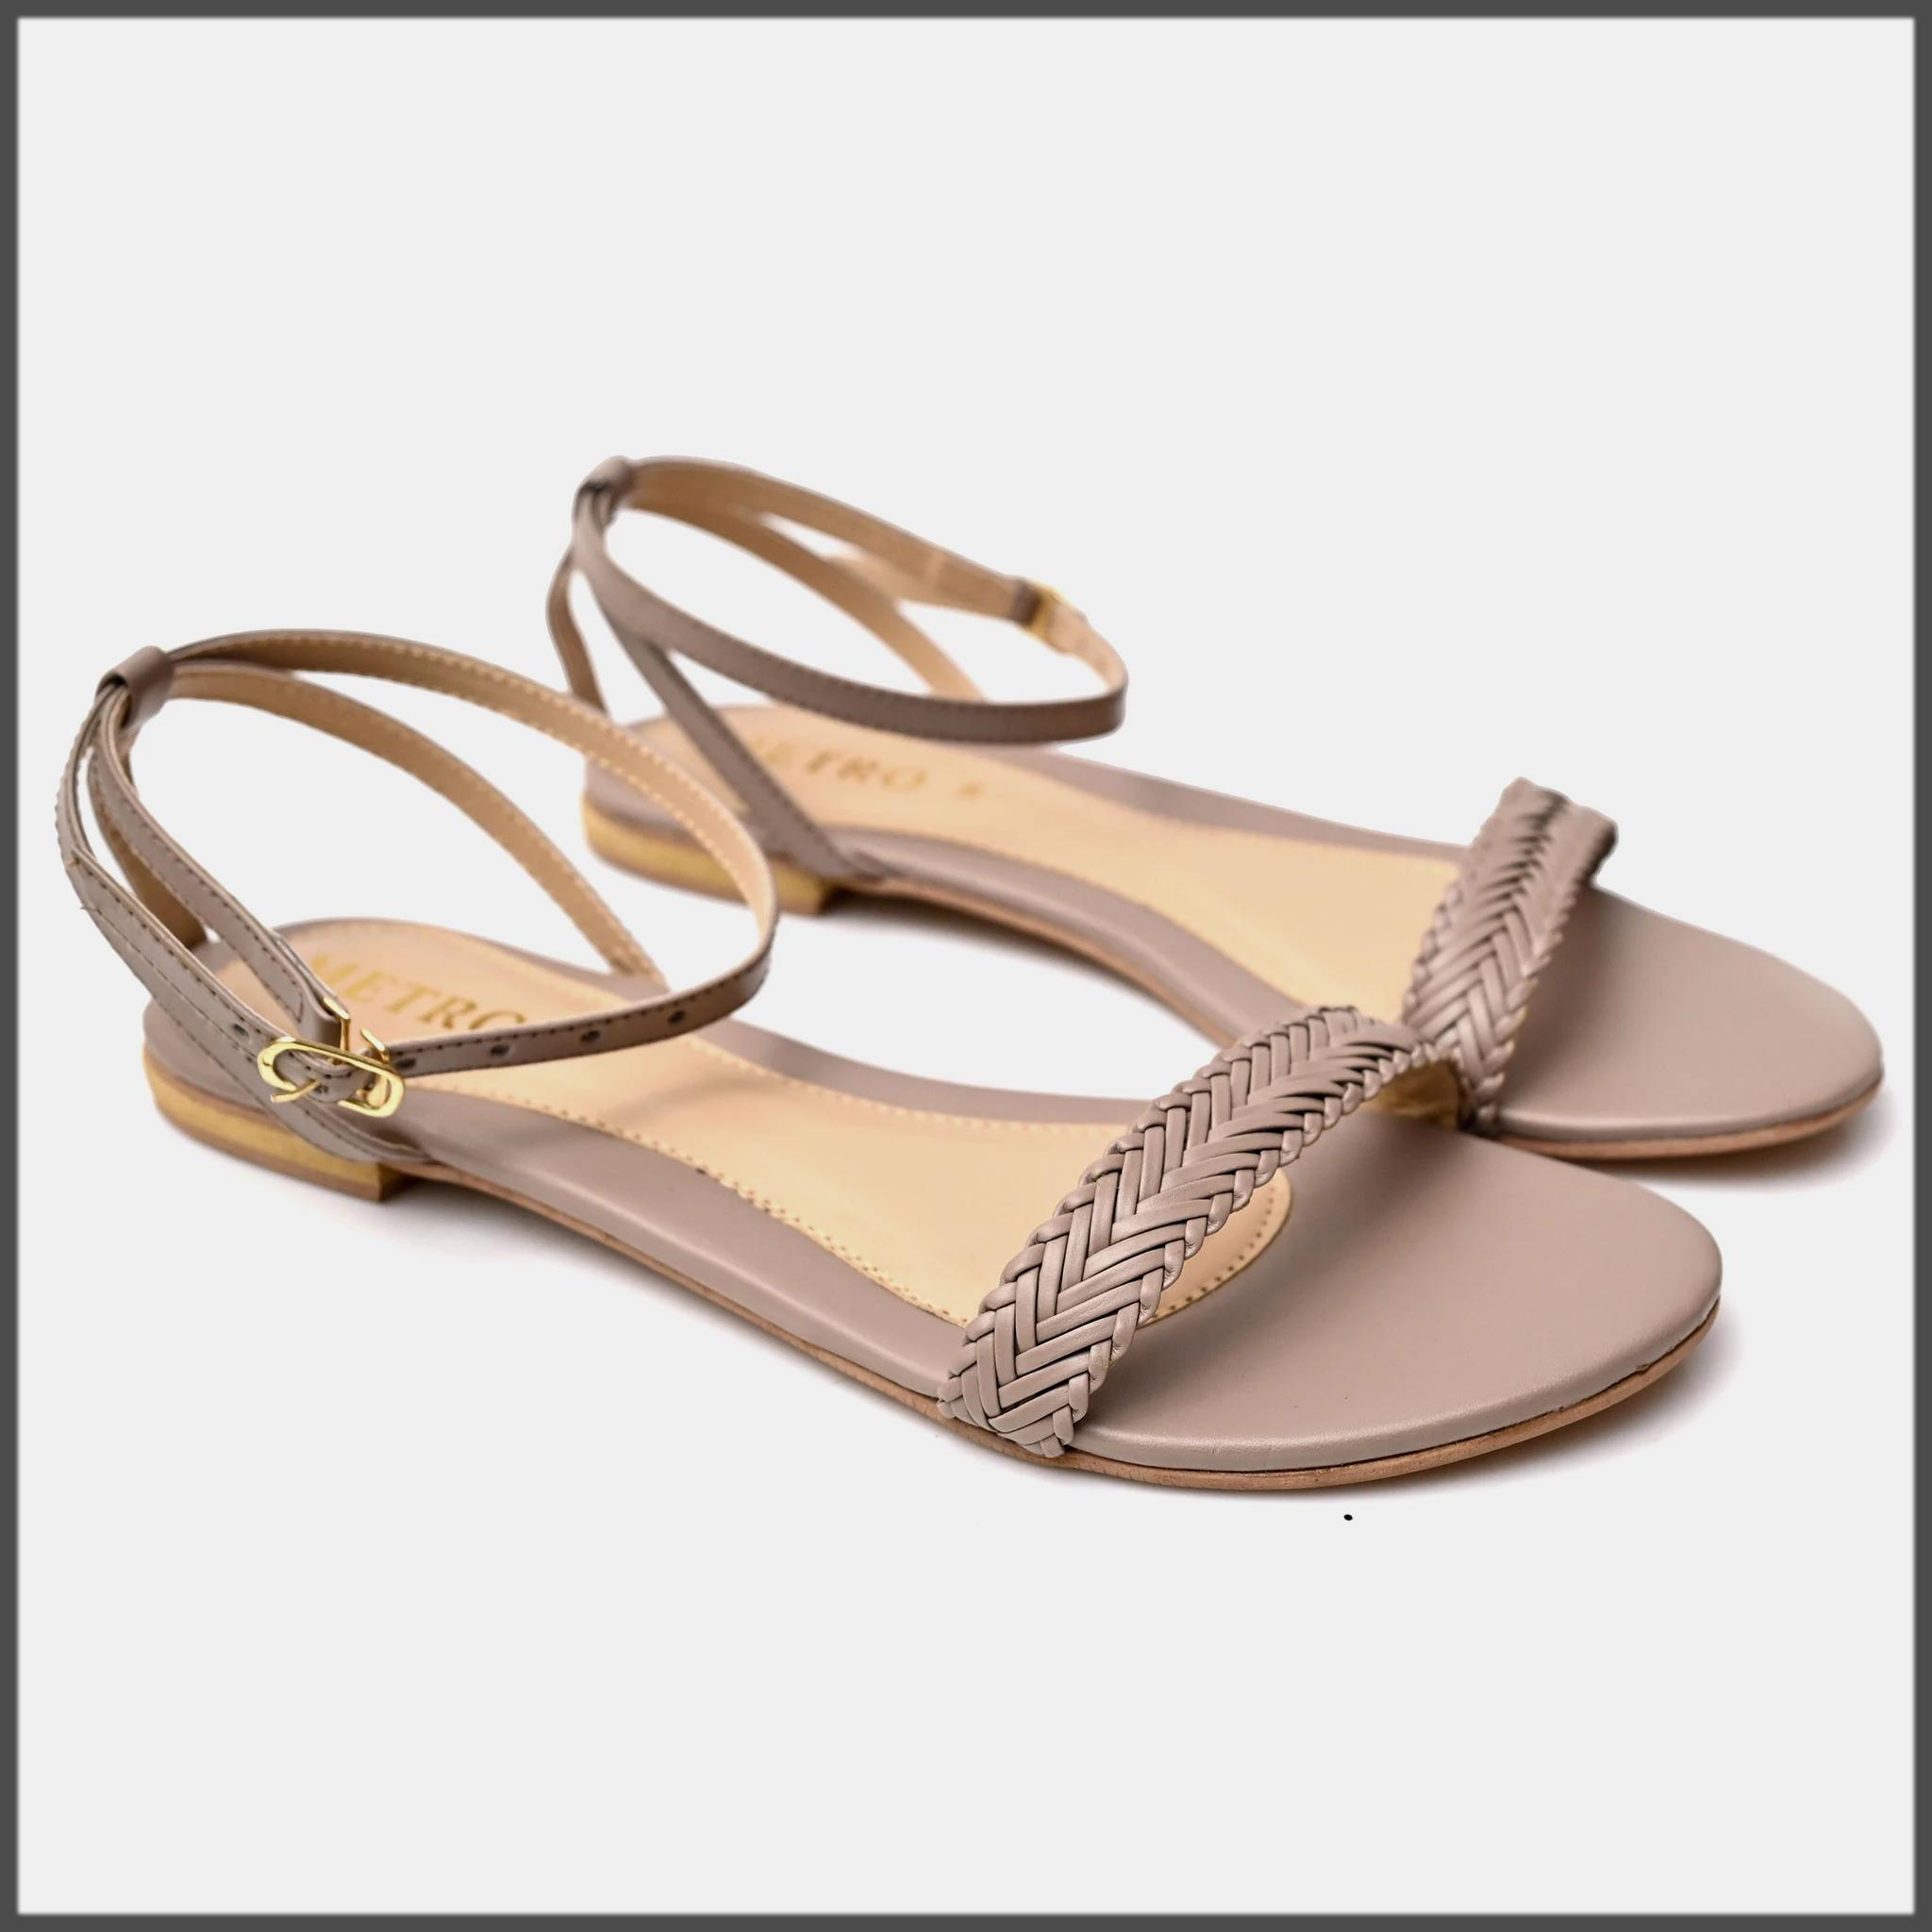 impressive summer sandals collection